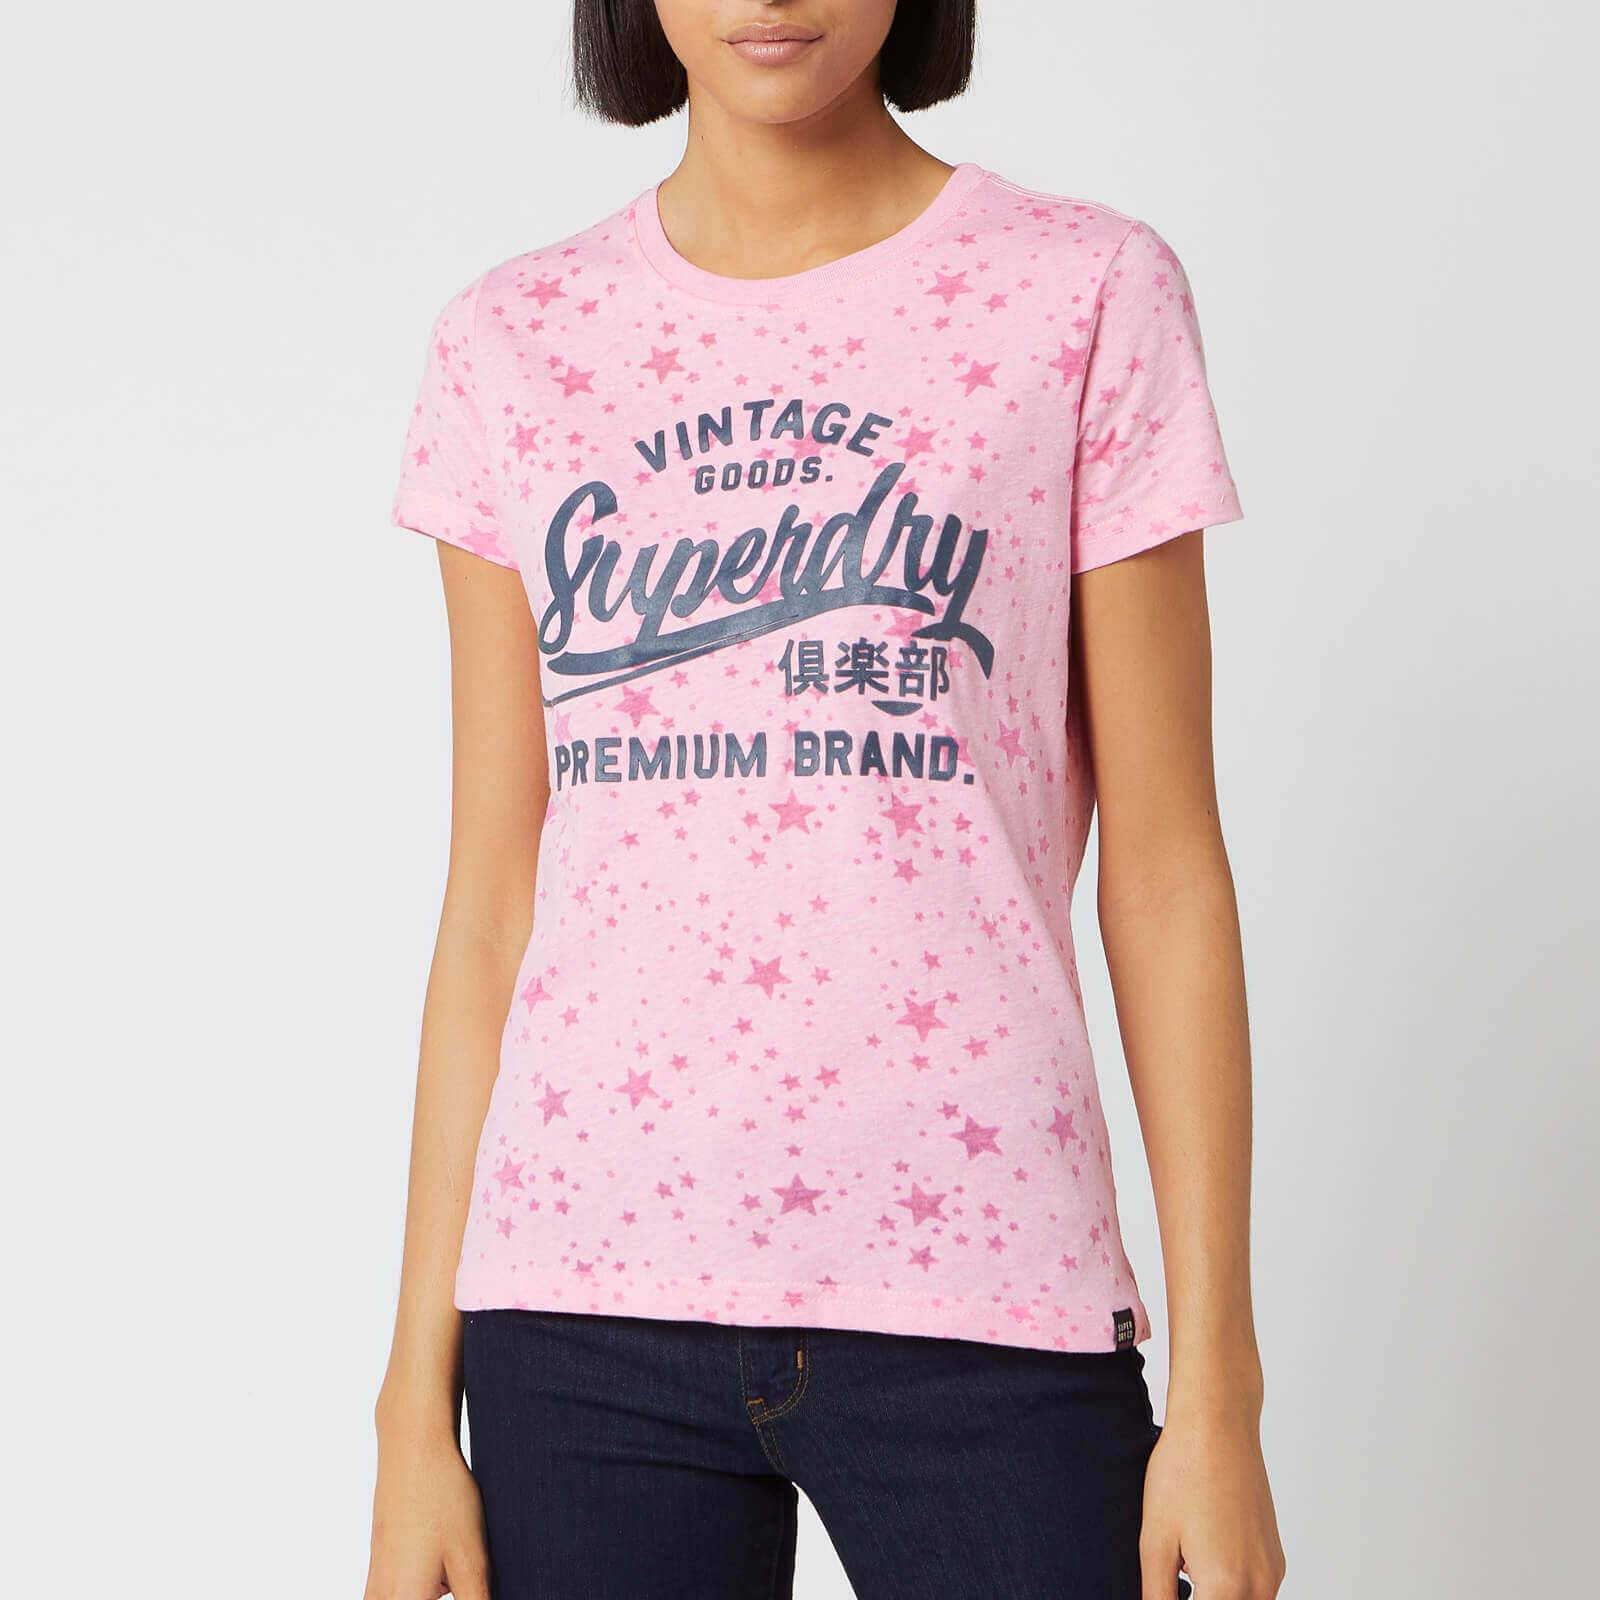 Superdry Women's Vintage Goods Star Aop Entry T-Shirt - Cherry Blossom Burn Out - UK 10 - Pink